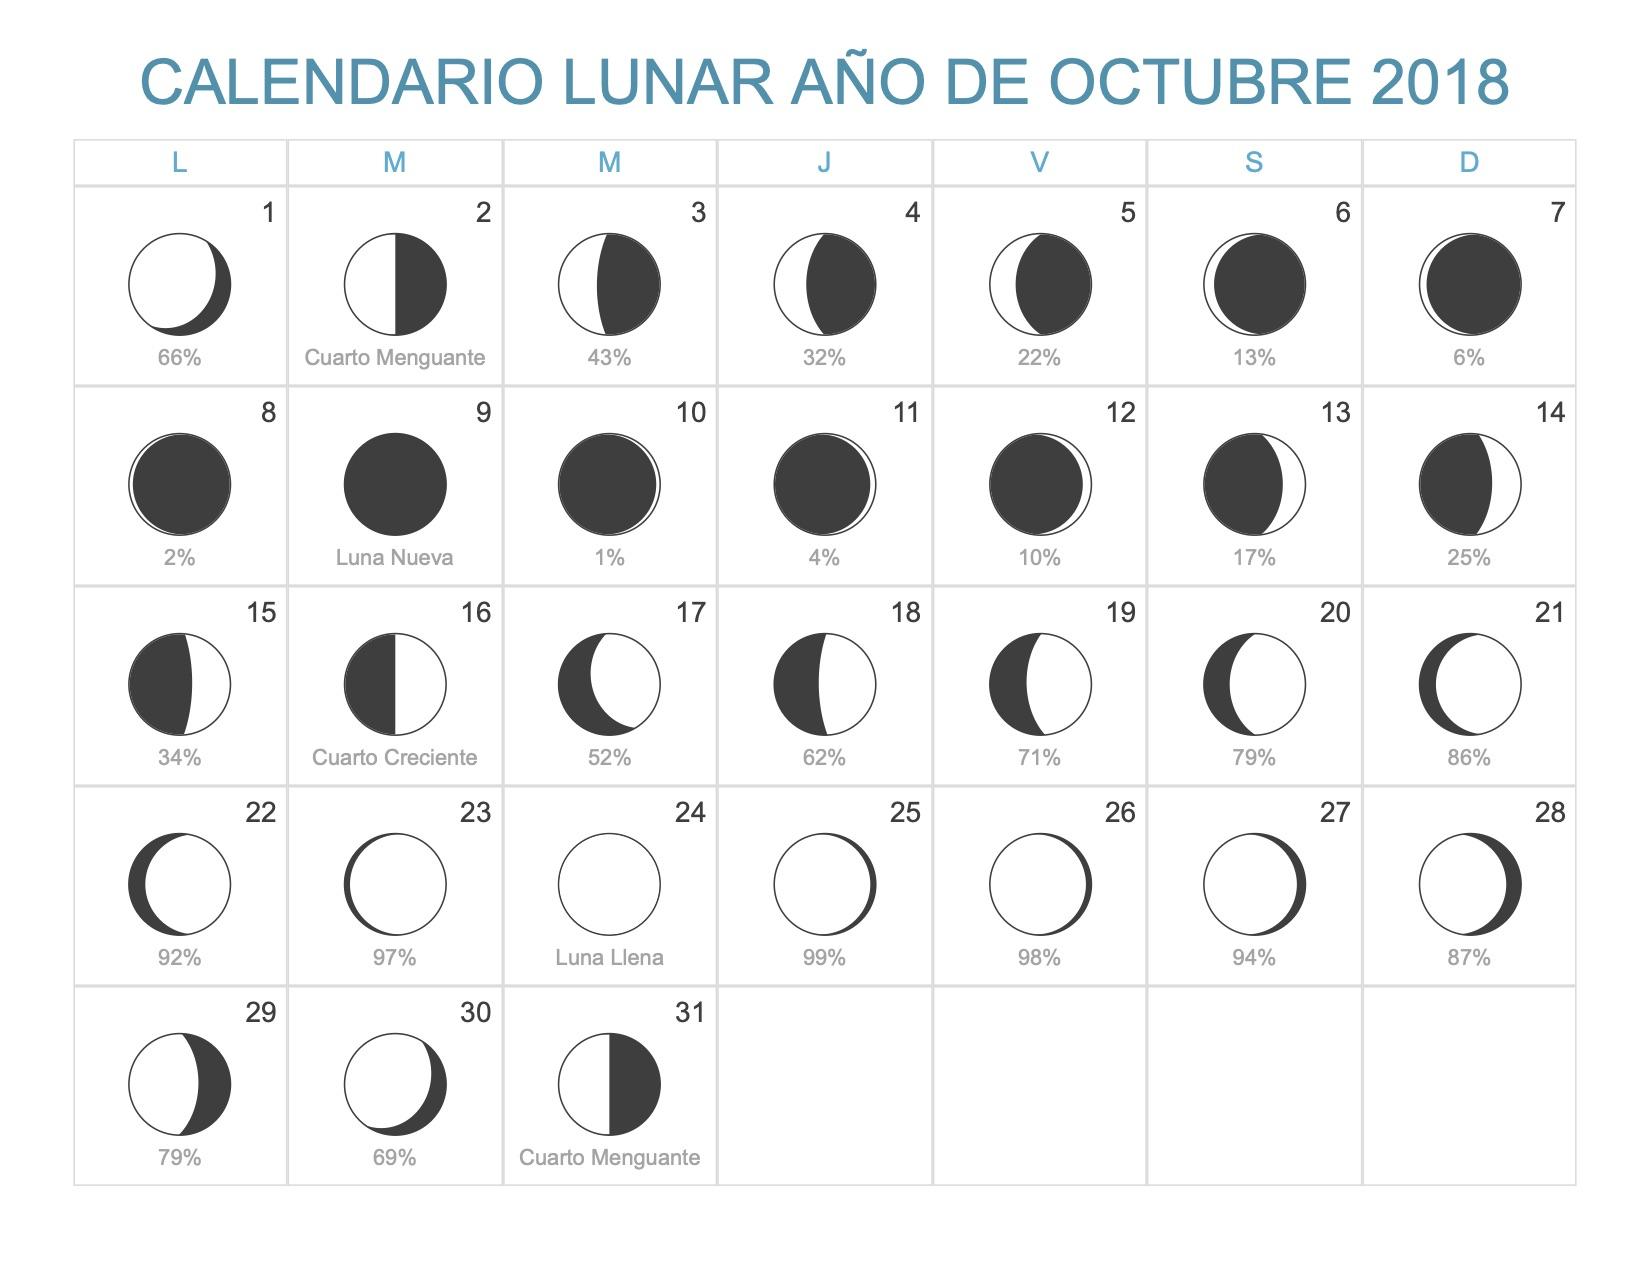 Calendario de octubre 2018 para imprimir Fase lunar octubre 2016